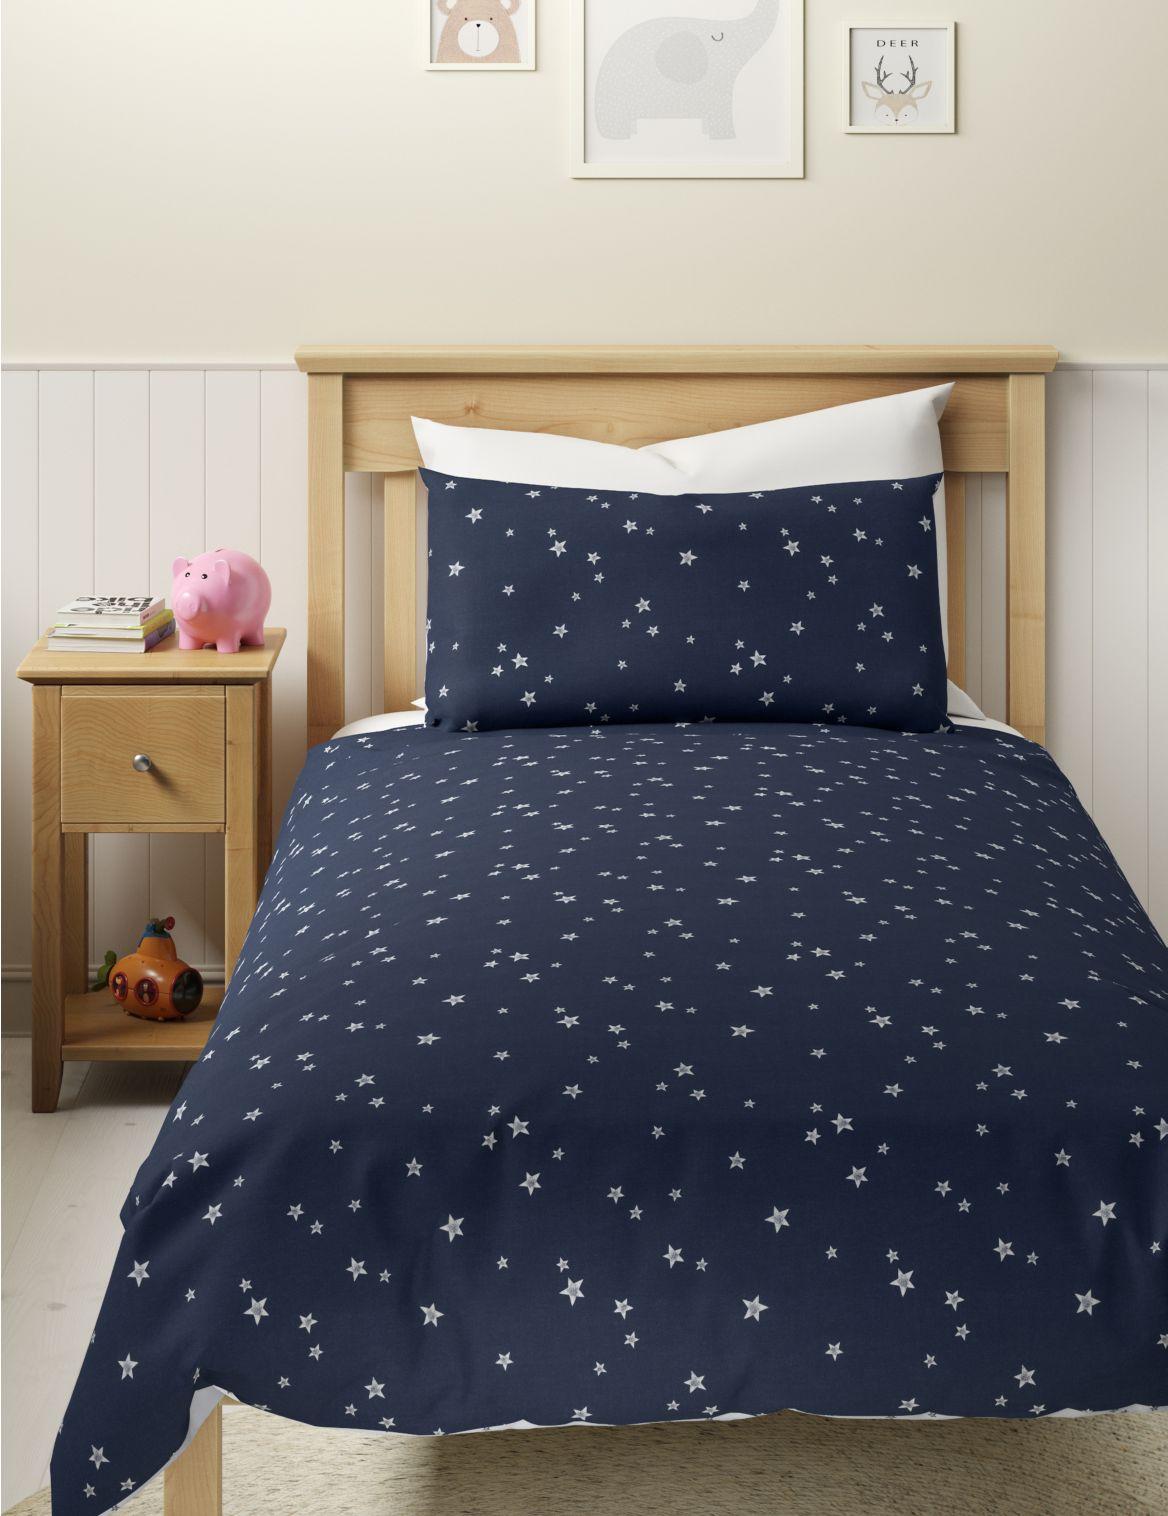 Stars Reversible Bedding Set navy mix